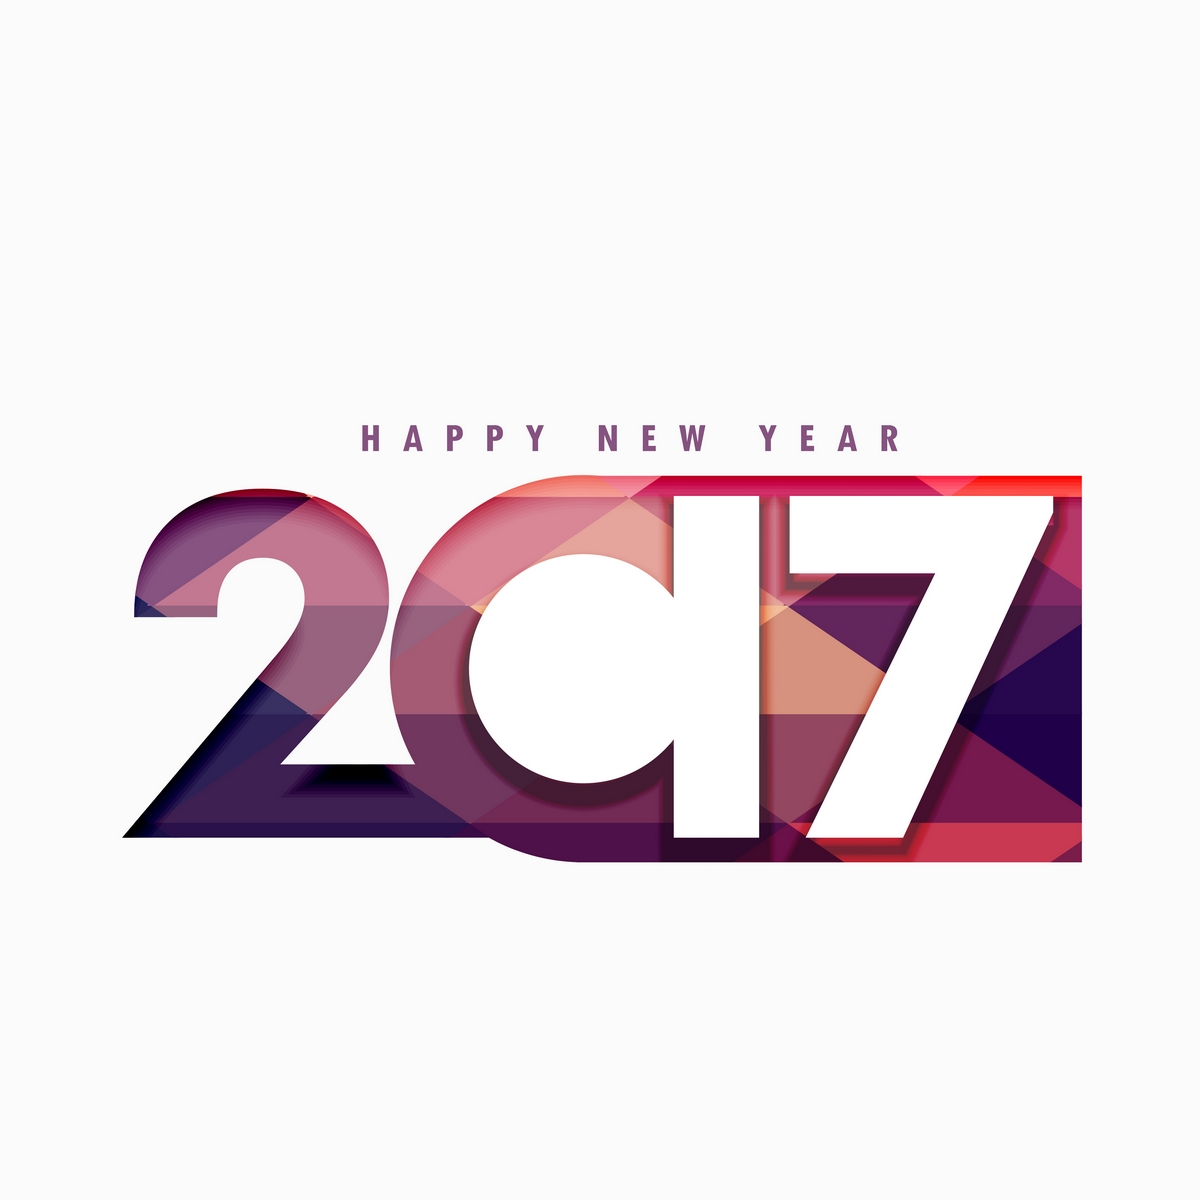 Blogging Tips for 2017